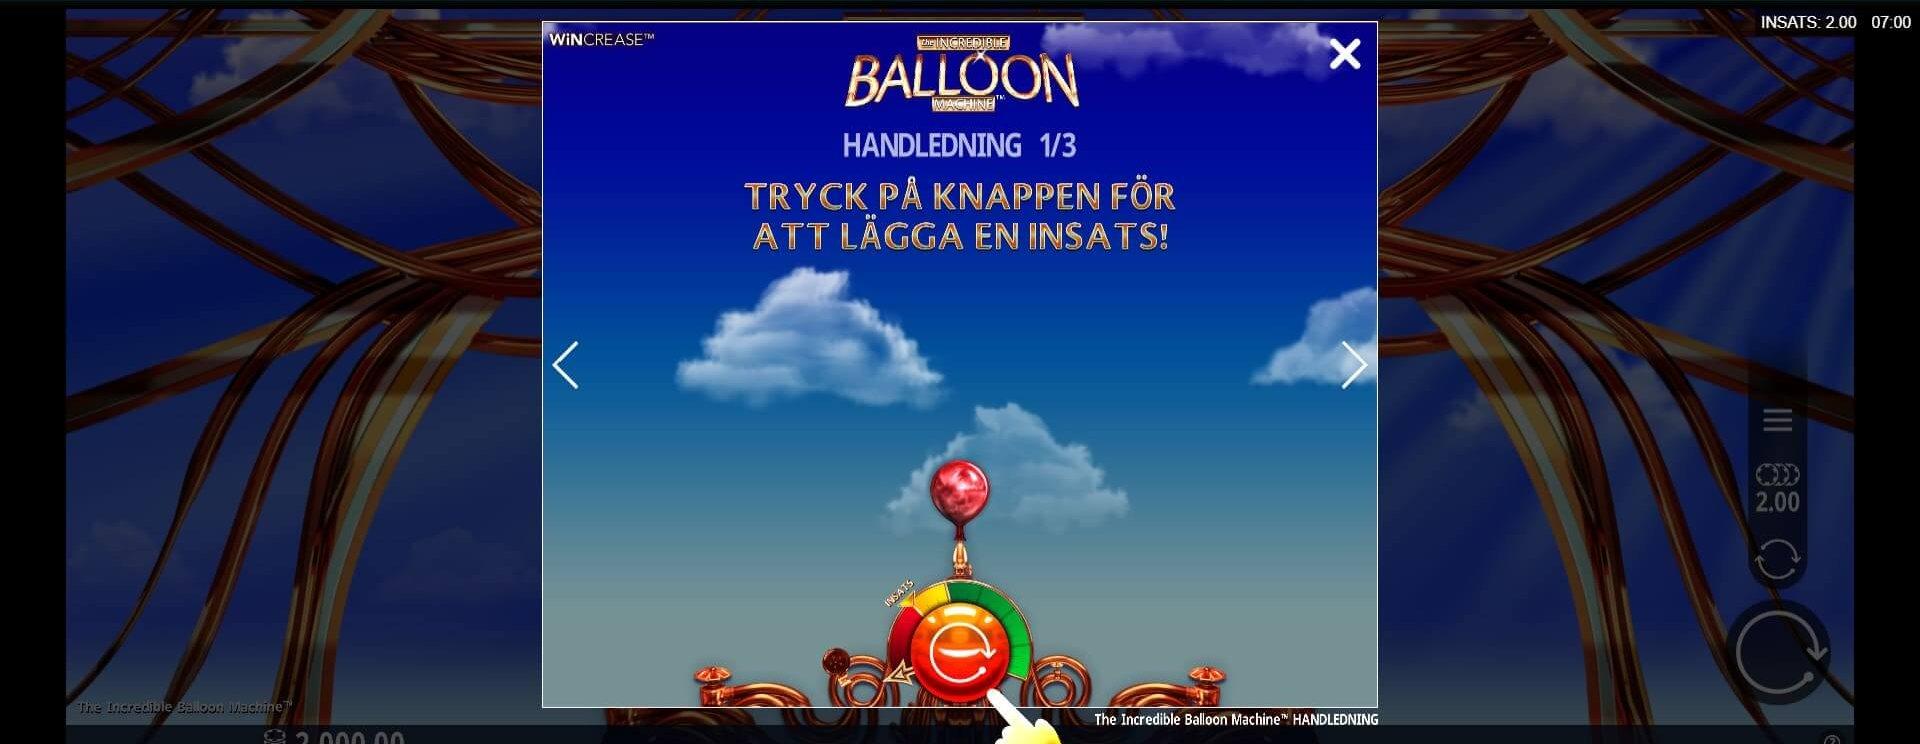 Testa The Incredeble Baloon Machine hos Playzee